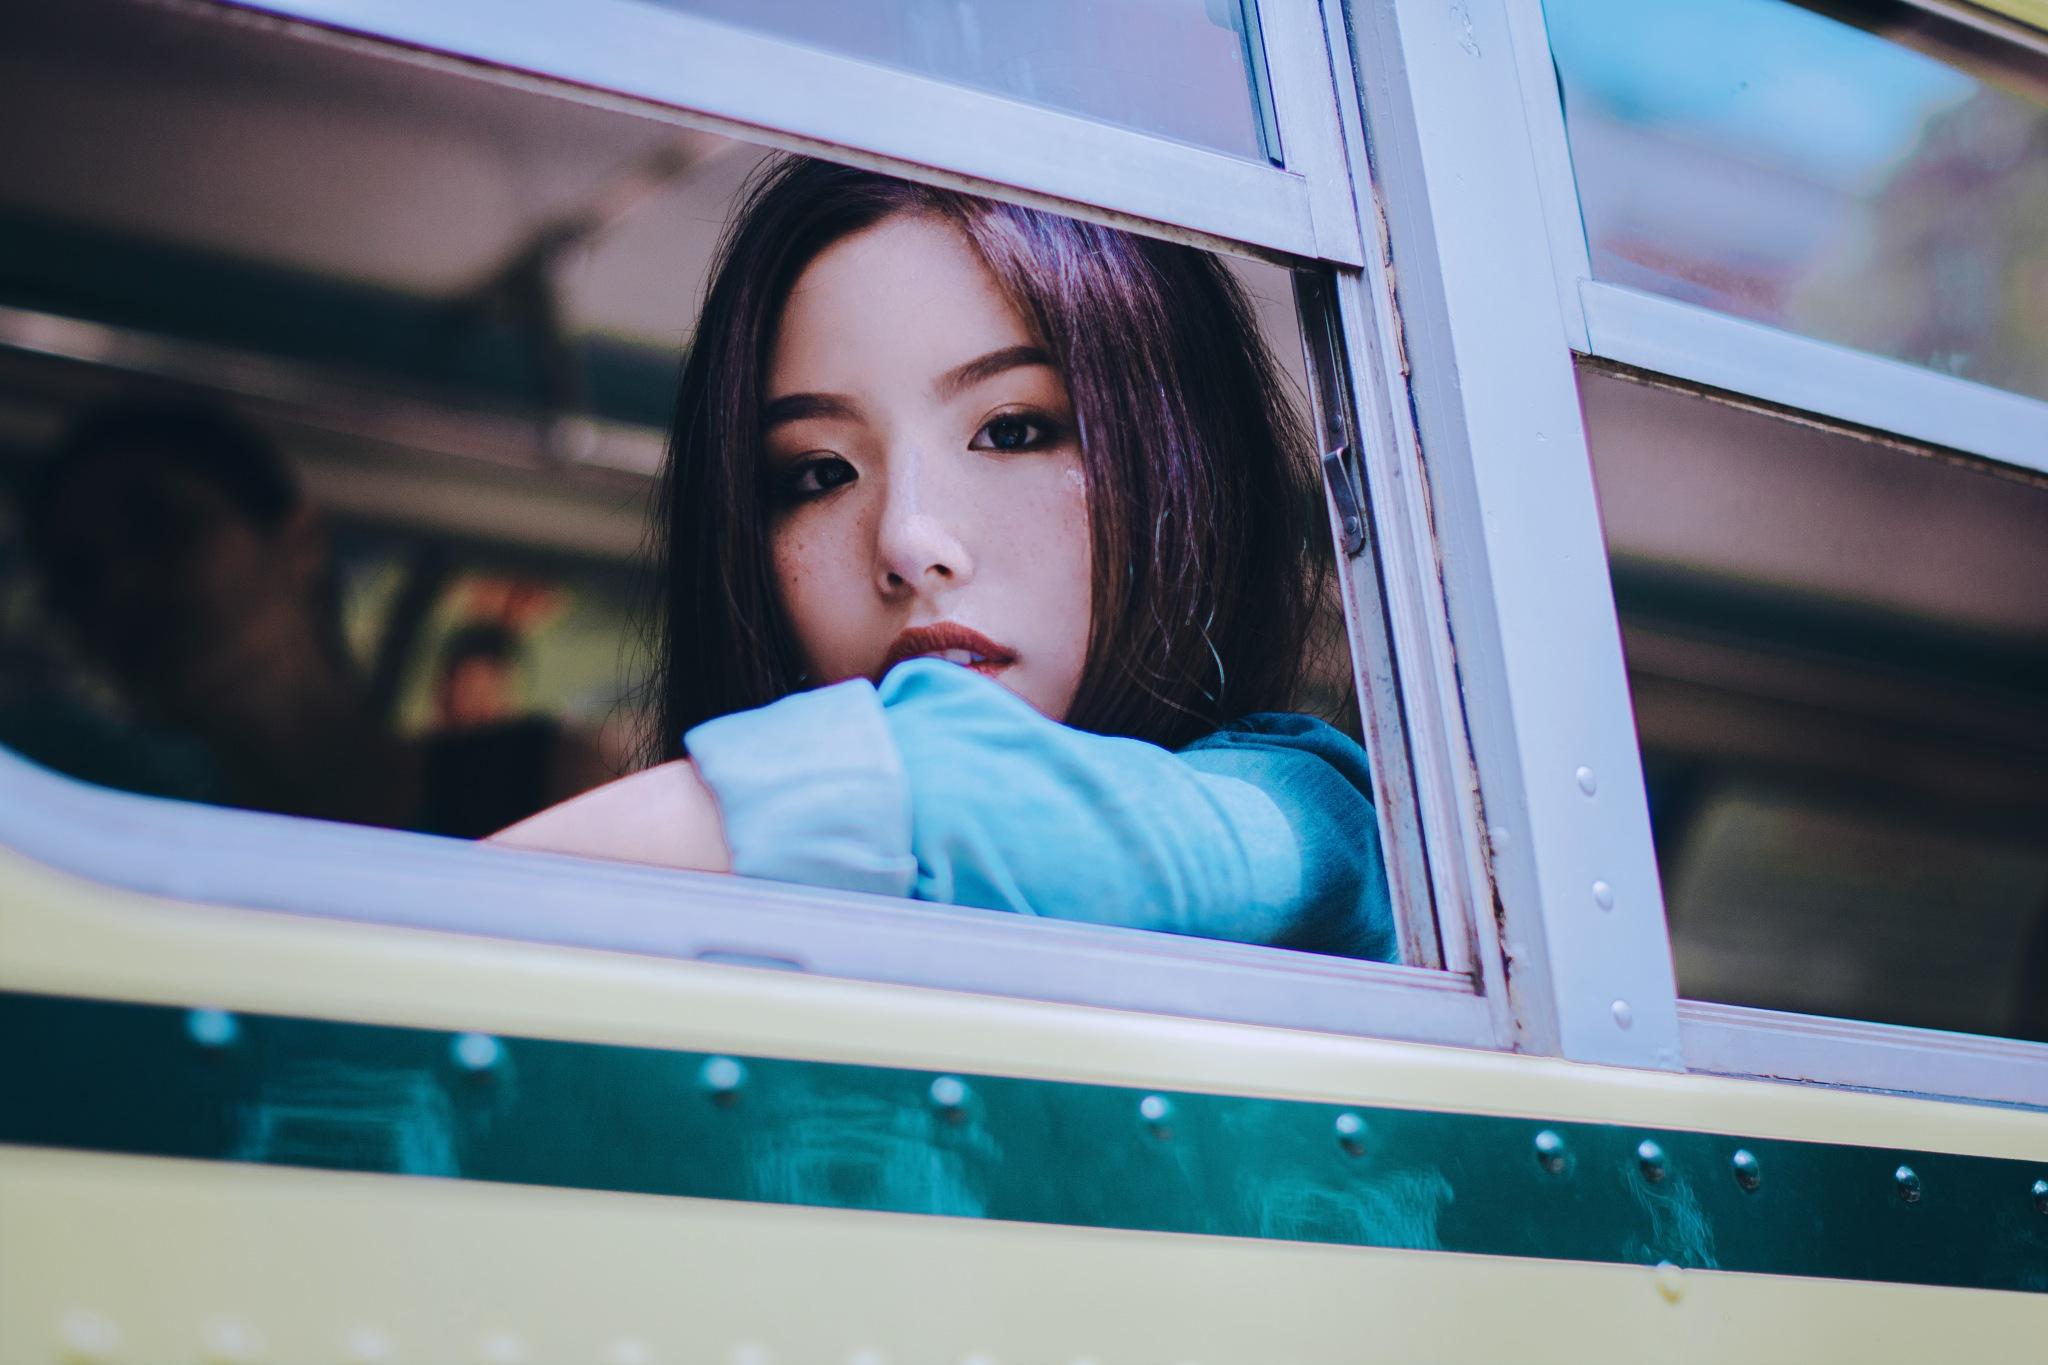 Ah...window sheets by Yoko D